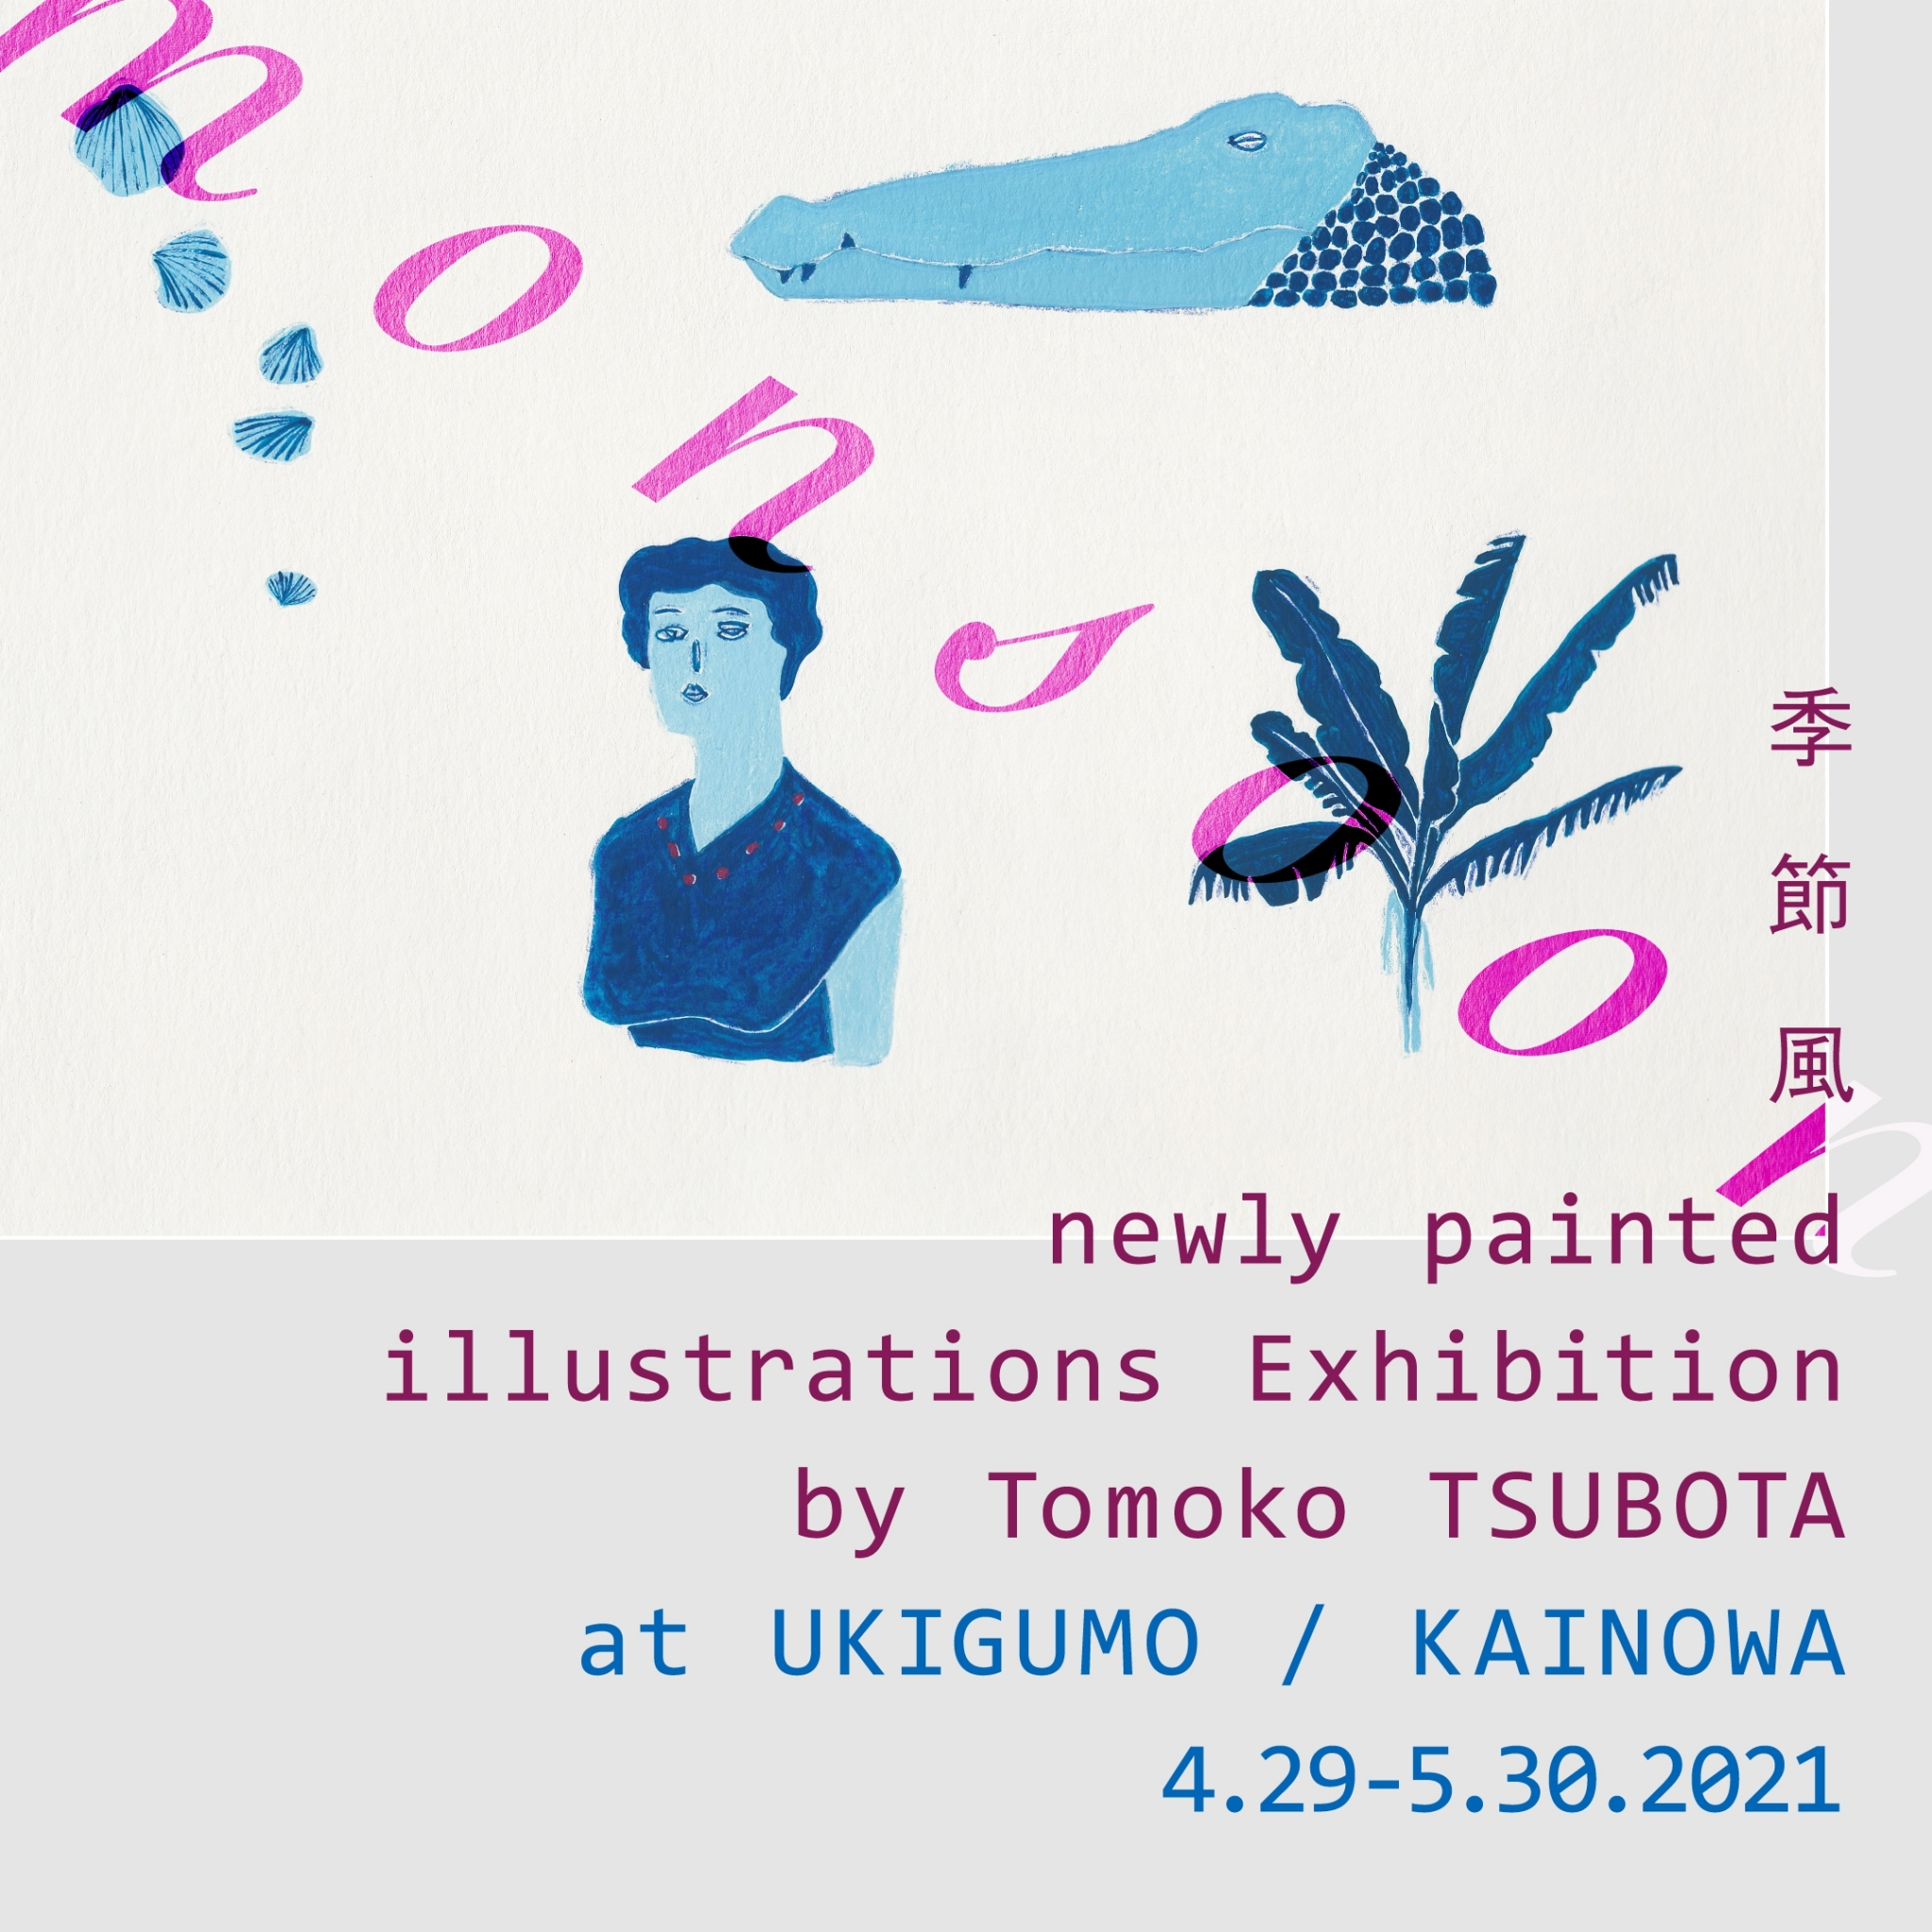 illustrations Exhibition NEWS 2021/05/26